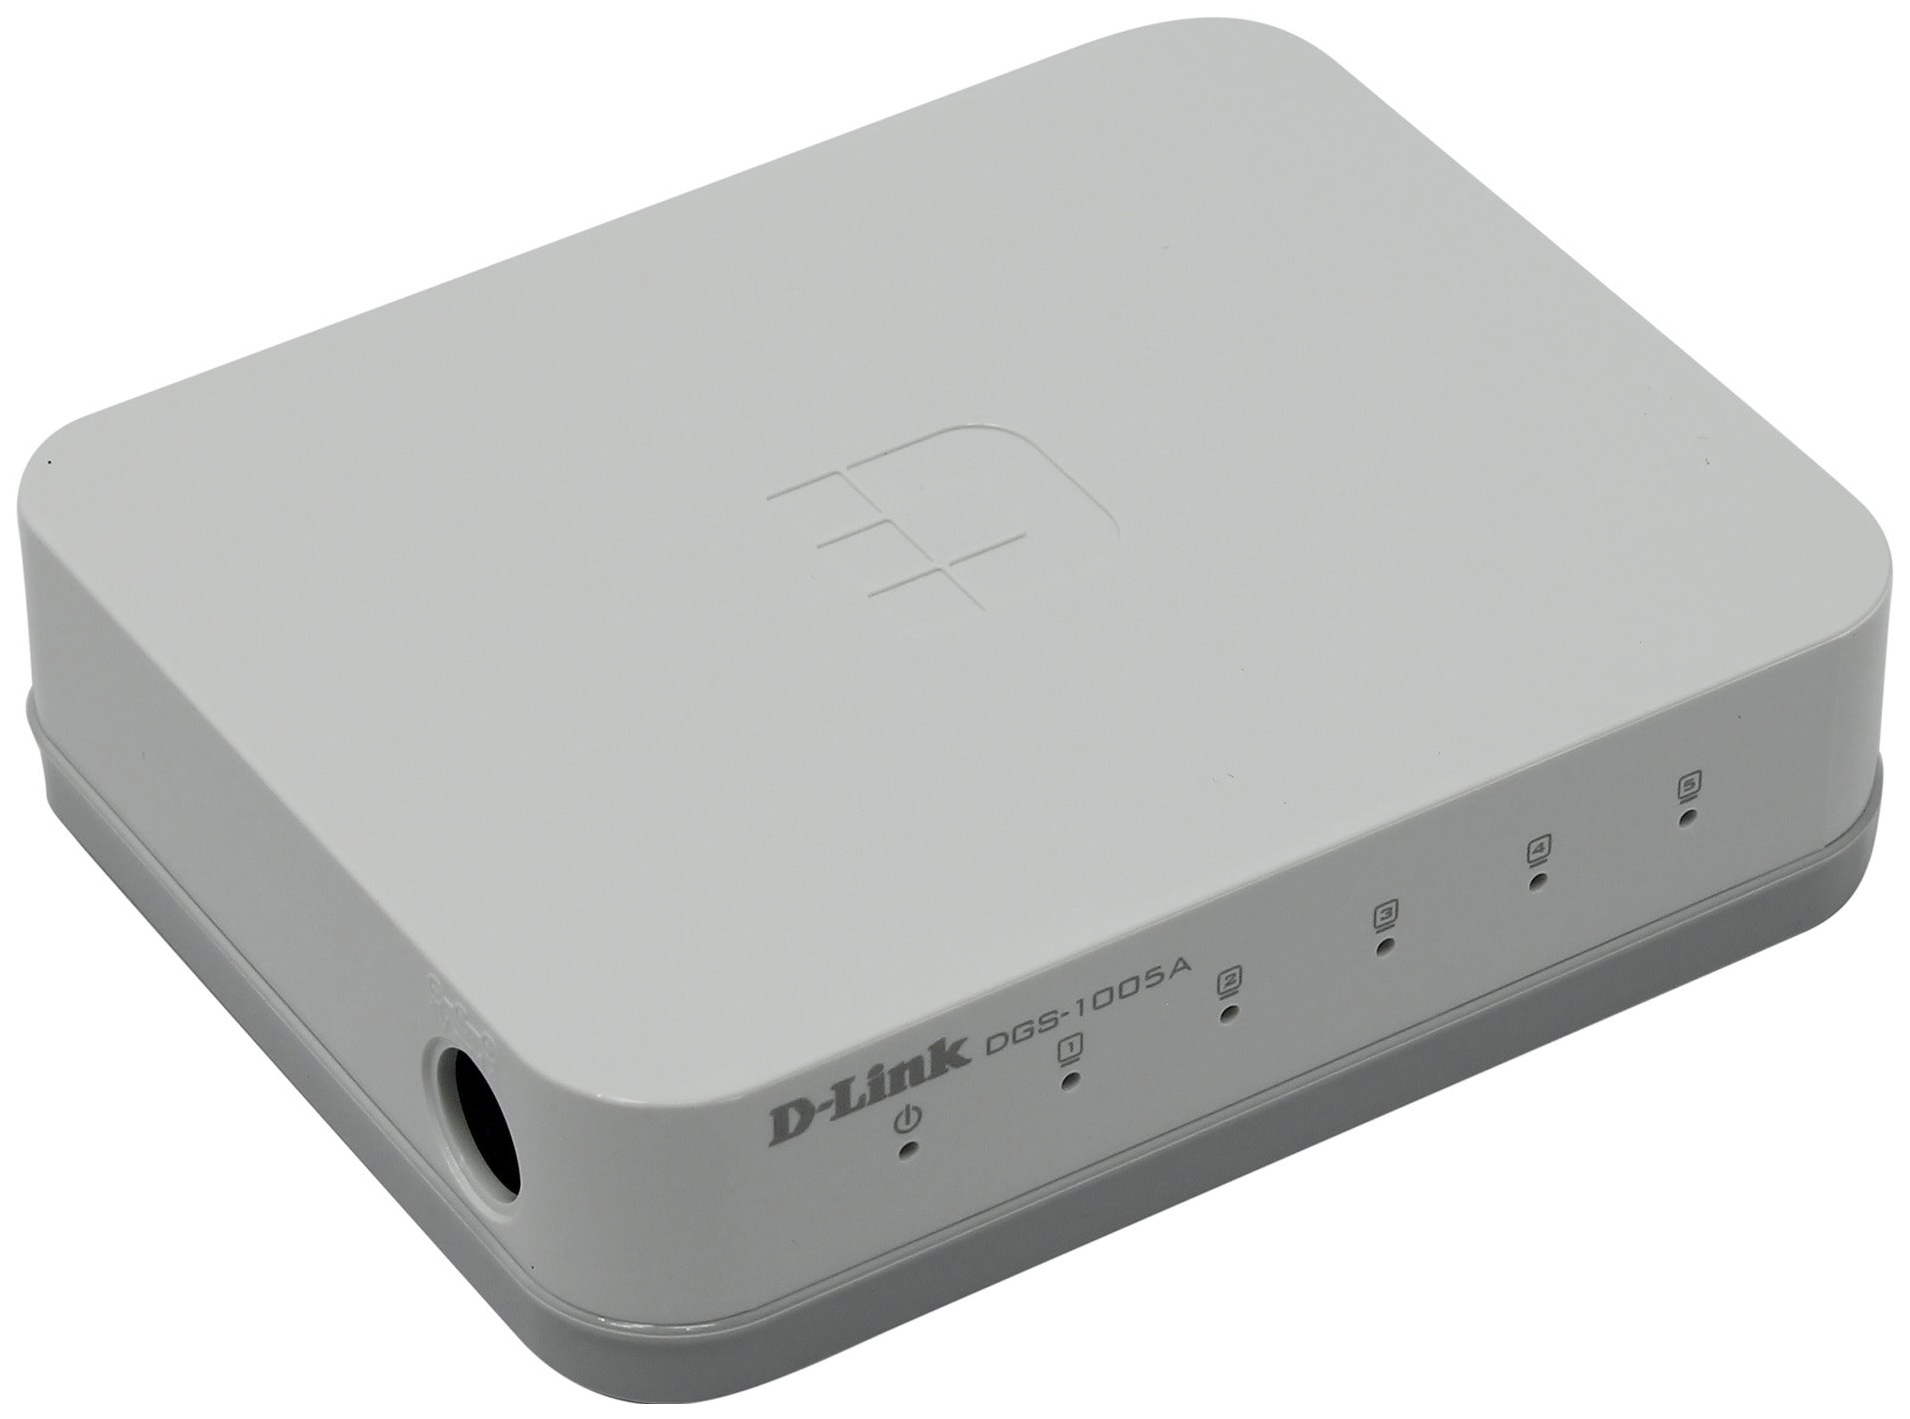 Коммутатор D Link DGS 1005A/C1B White